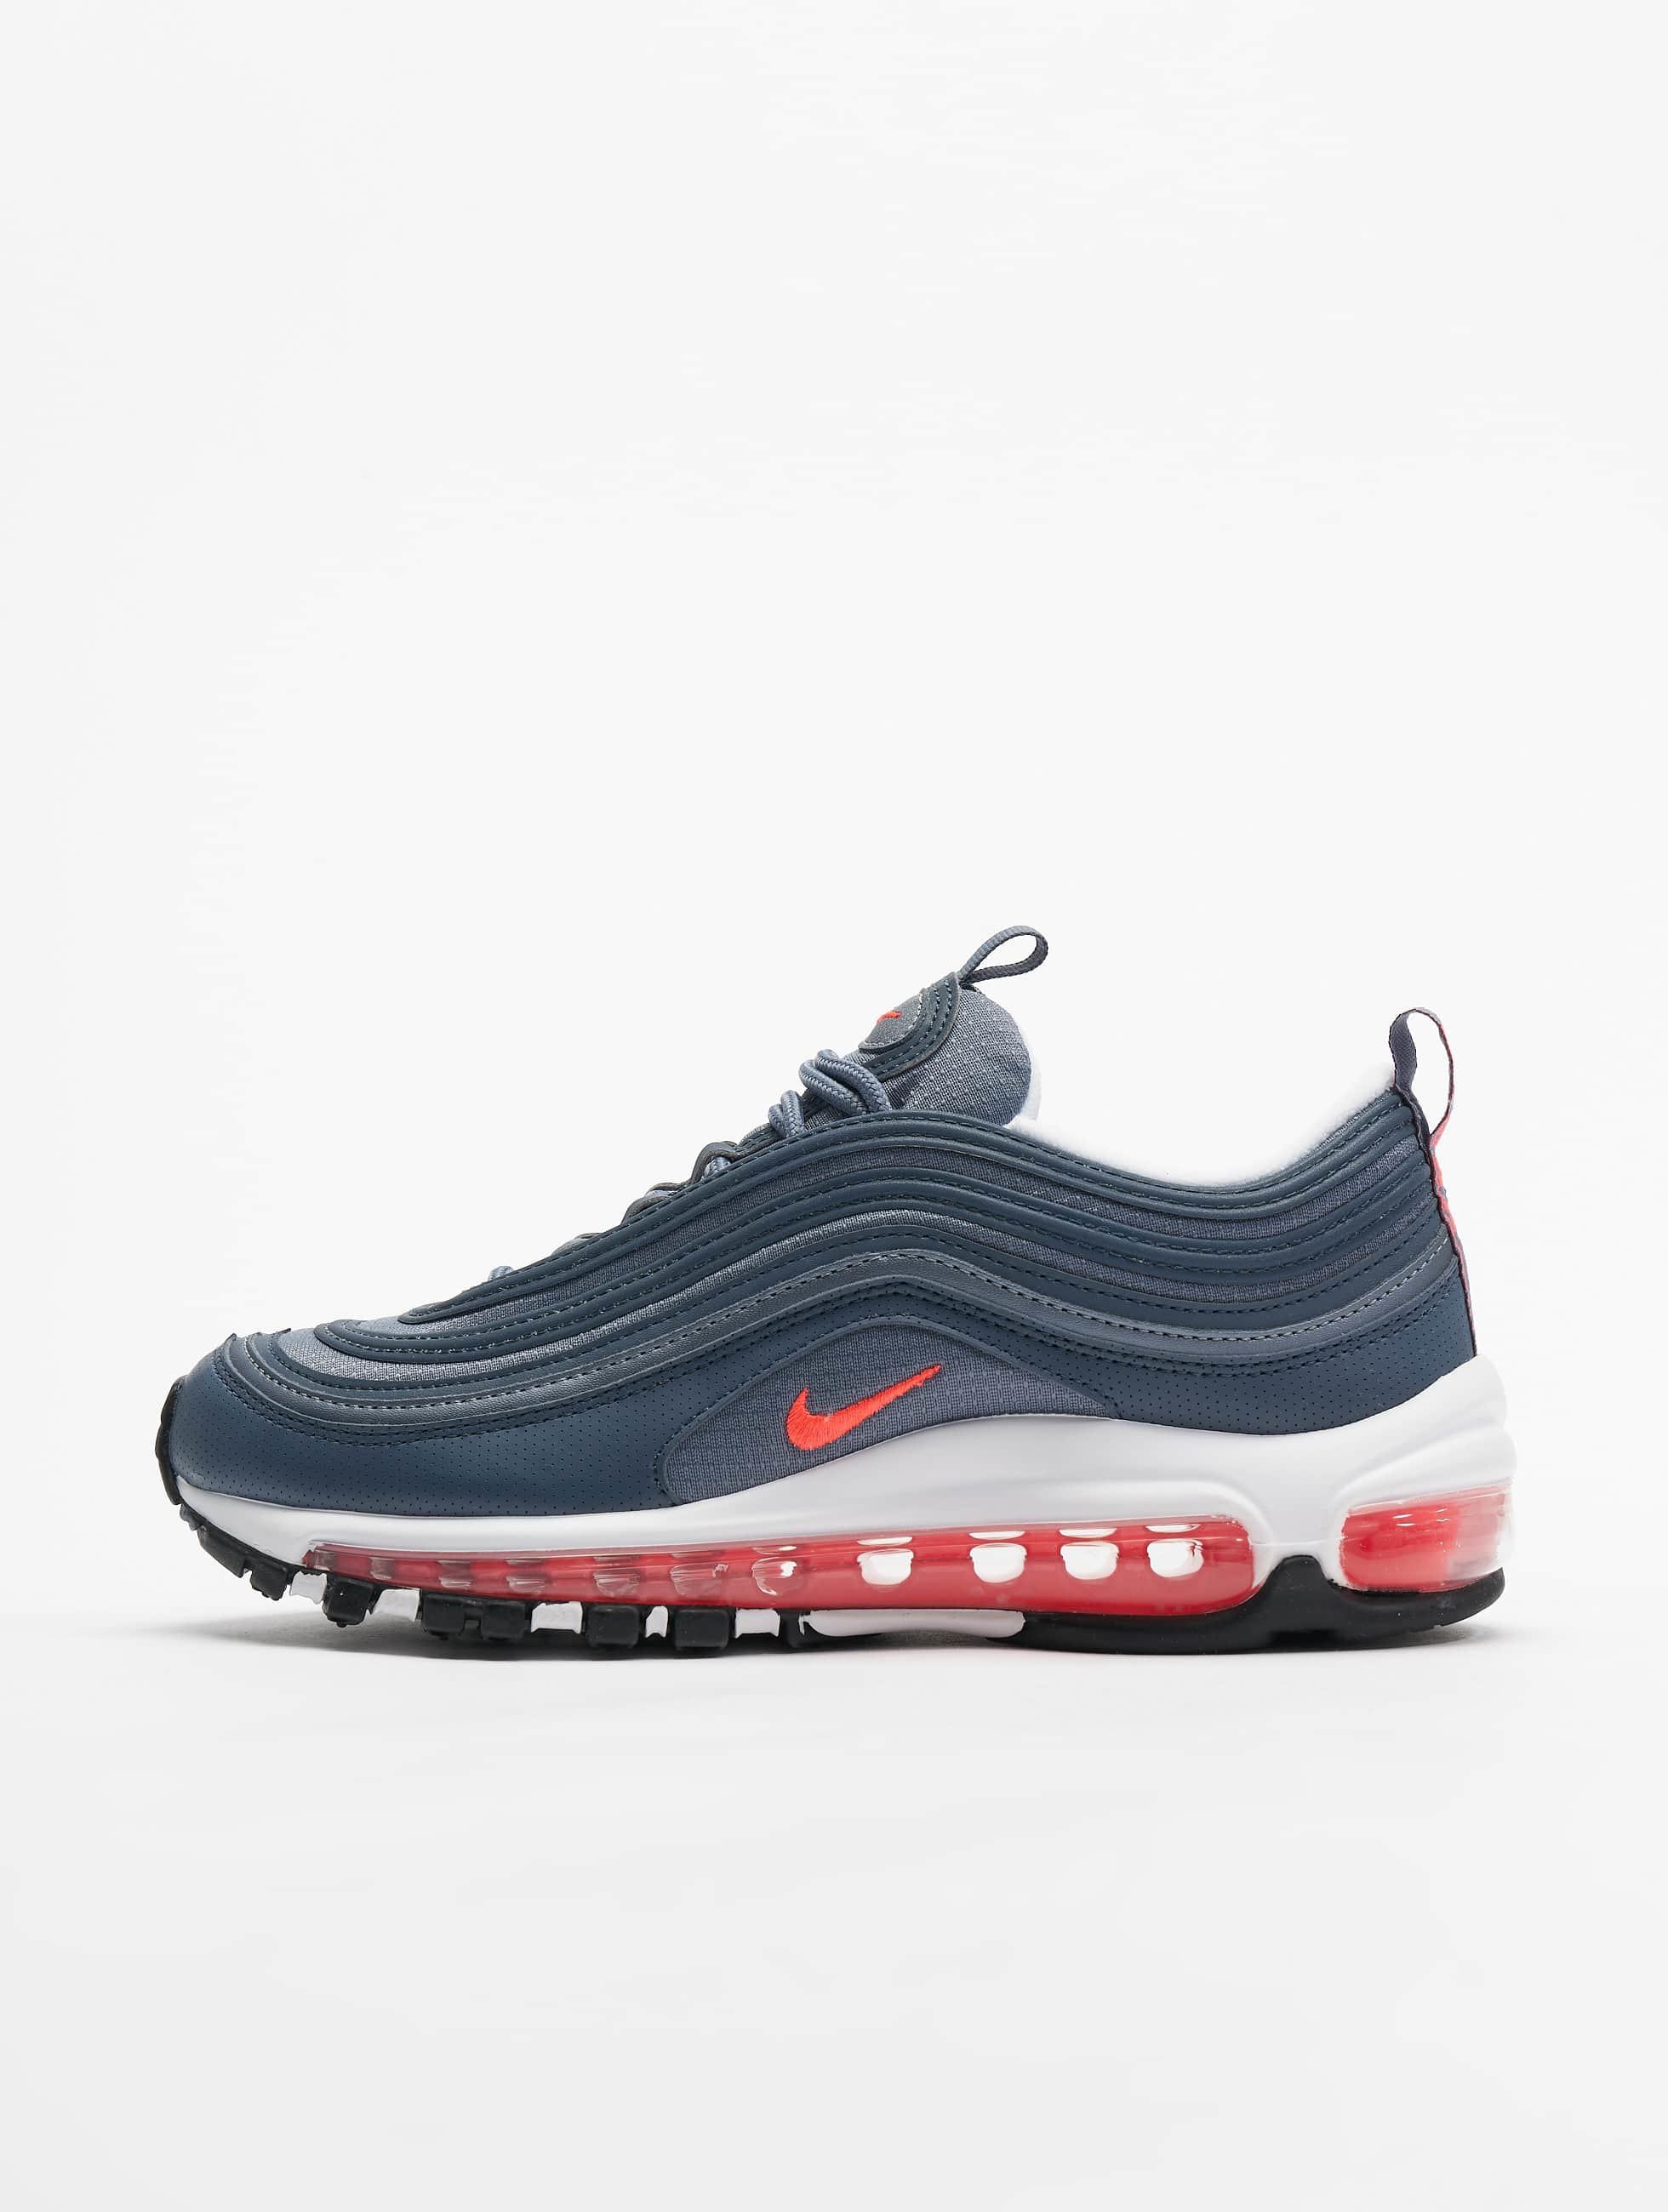 Nike Air Max 97 (GS) Sneakers Monsoon BlueFlash Crimson